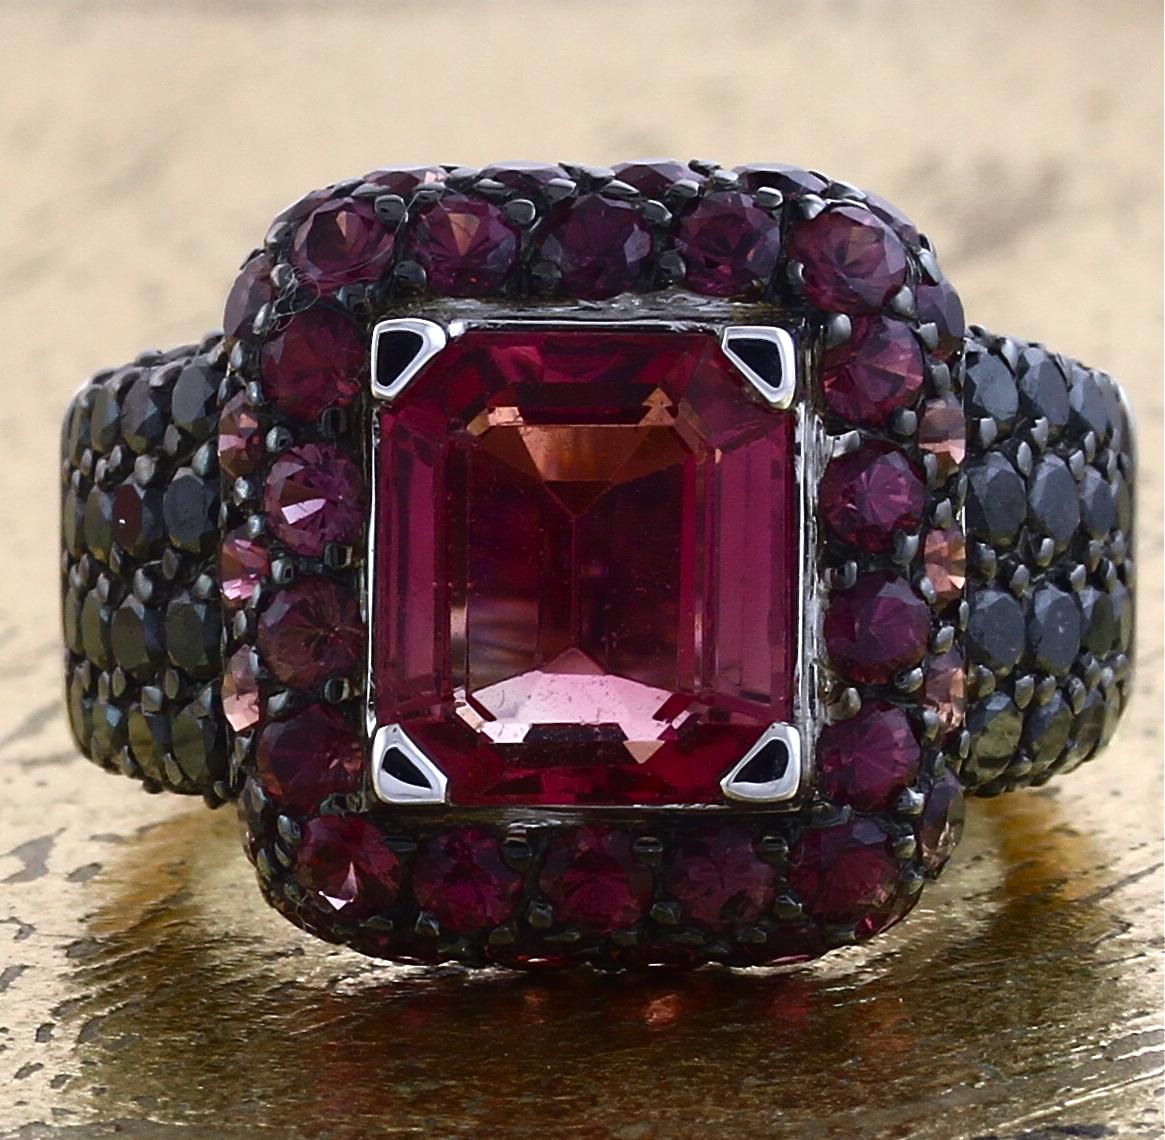 Pink Tourmaline Ring with Black Diamonds - Item No: 0011524